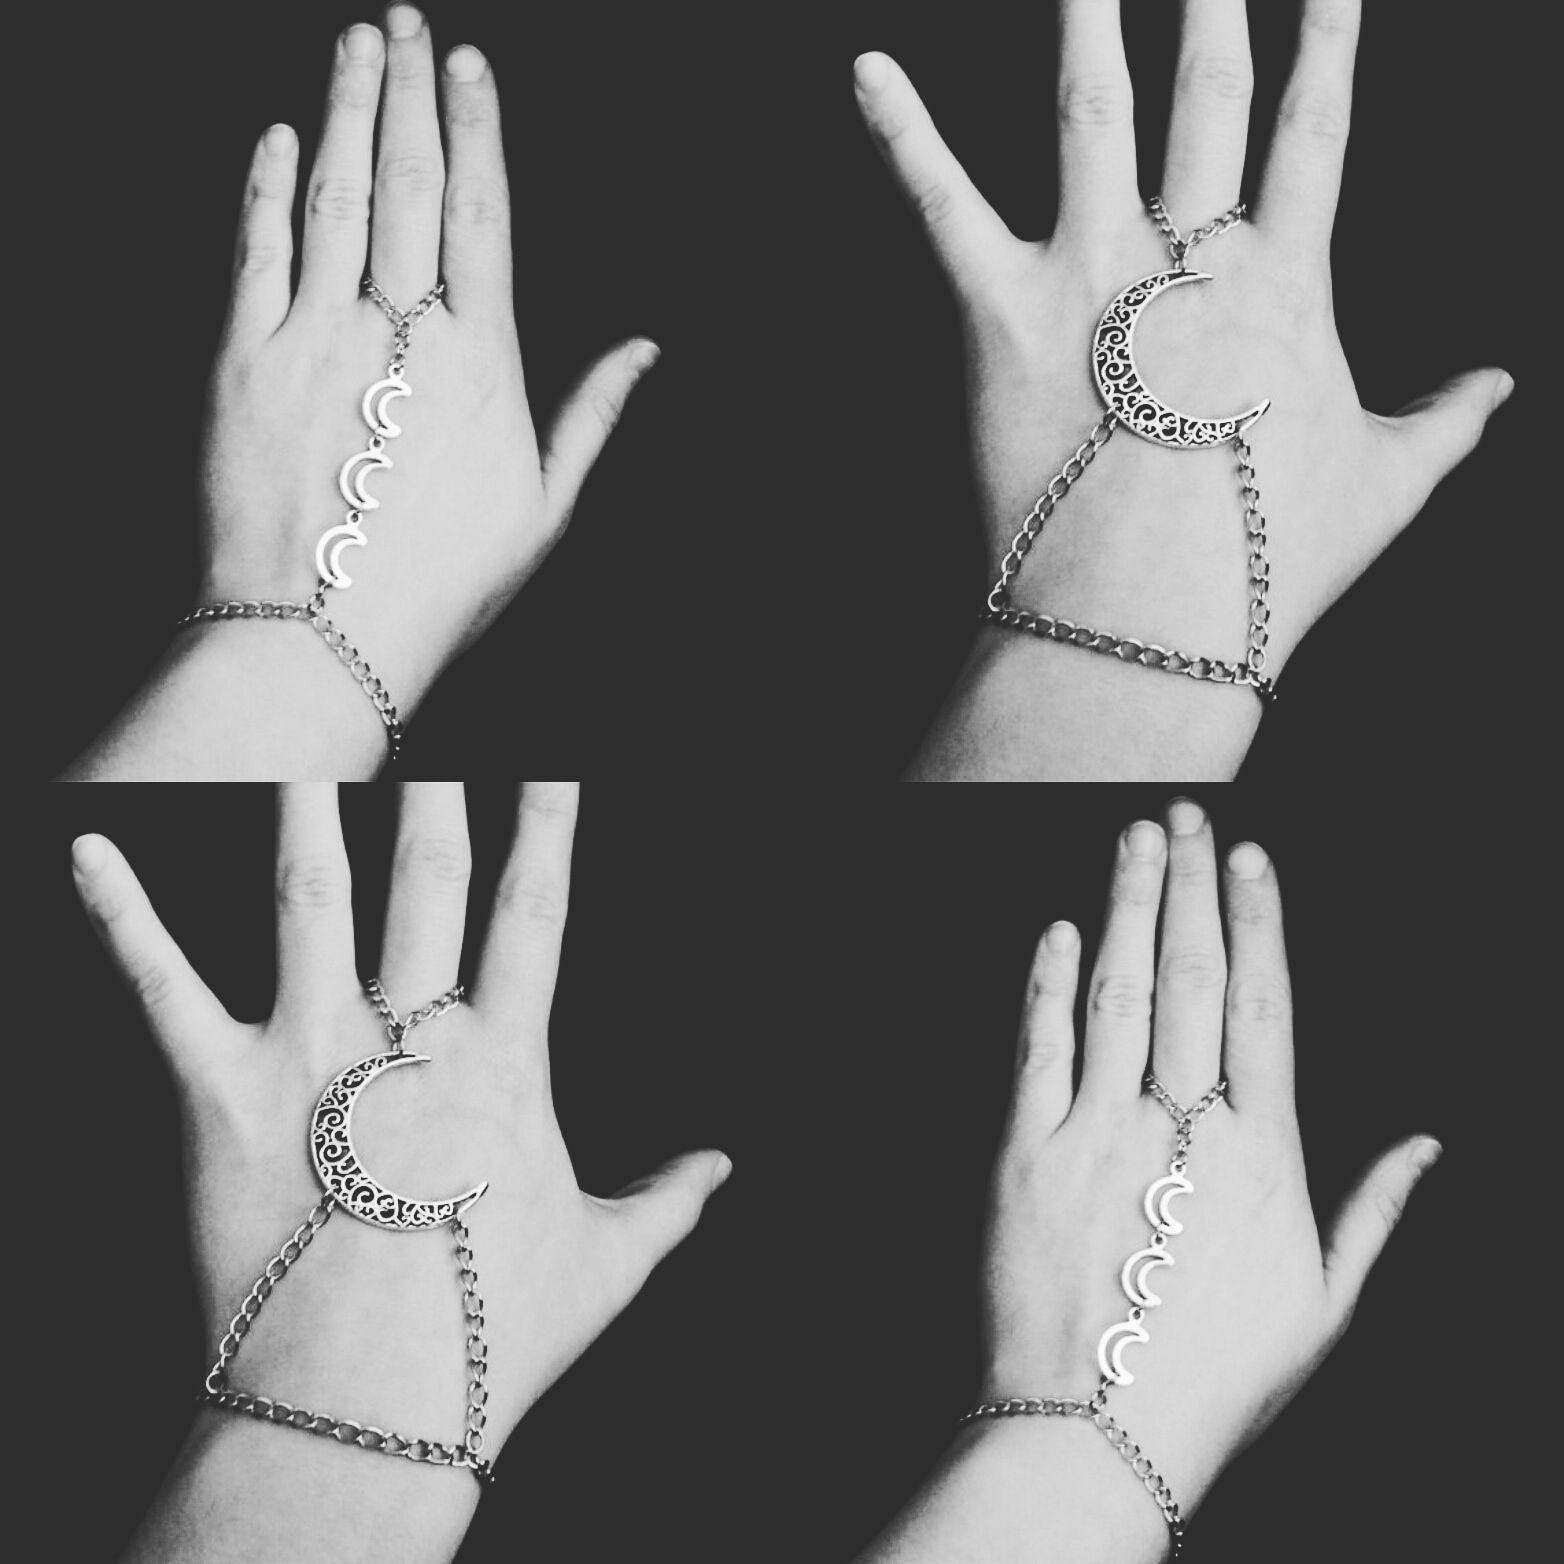 nu goth hand chains restocked☽www.etsy..com/shop/OfStarsAndWine